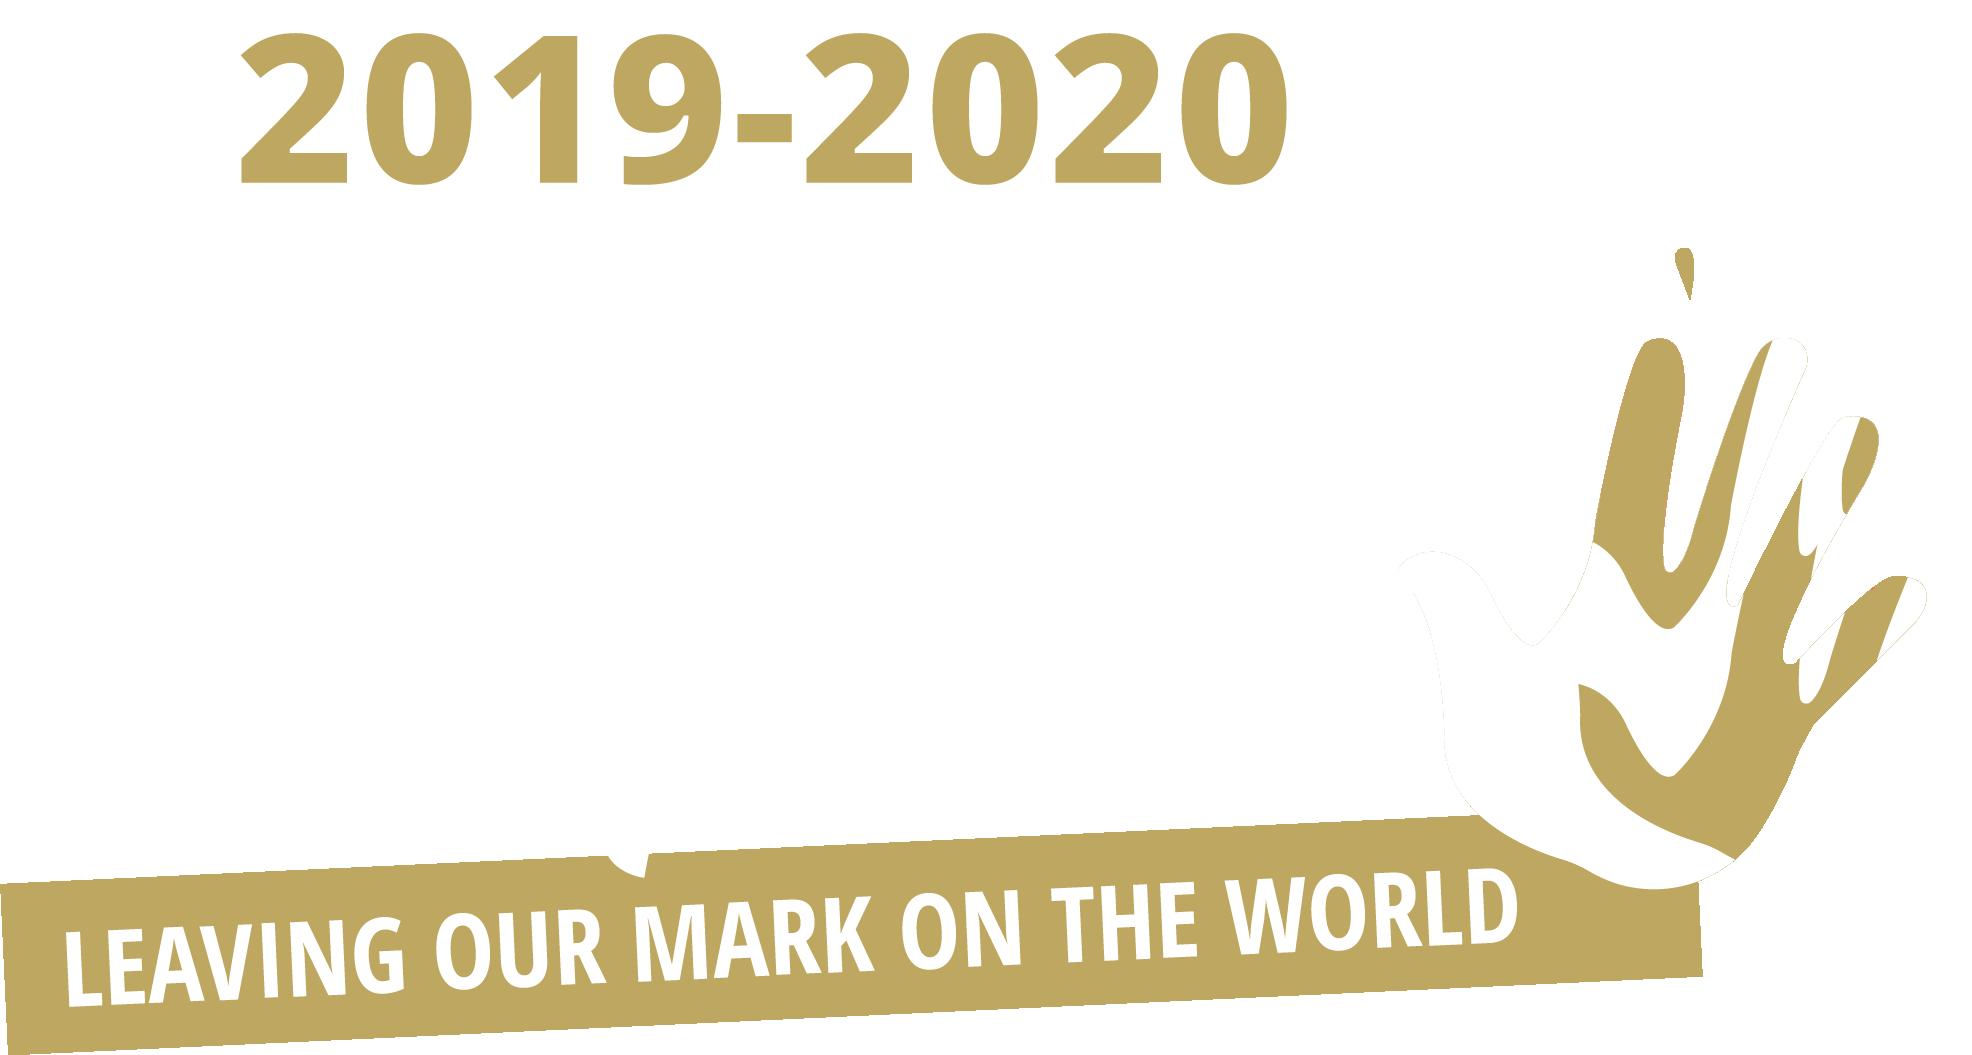 2019-2020 Accomplishments Report